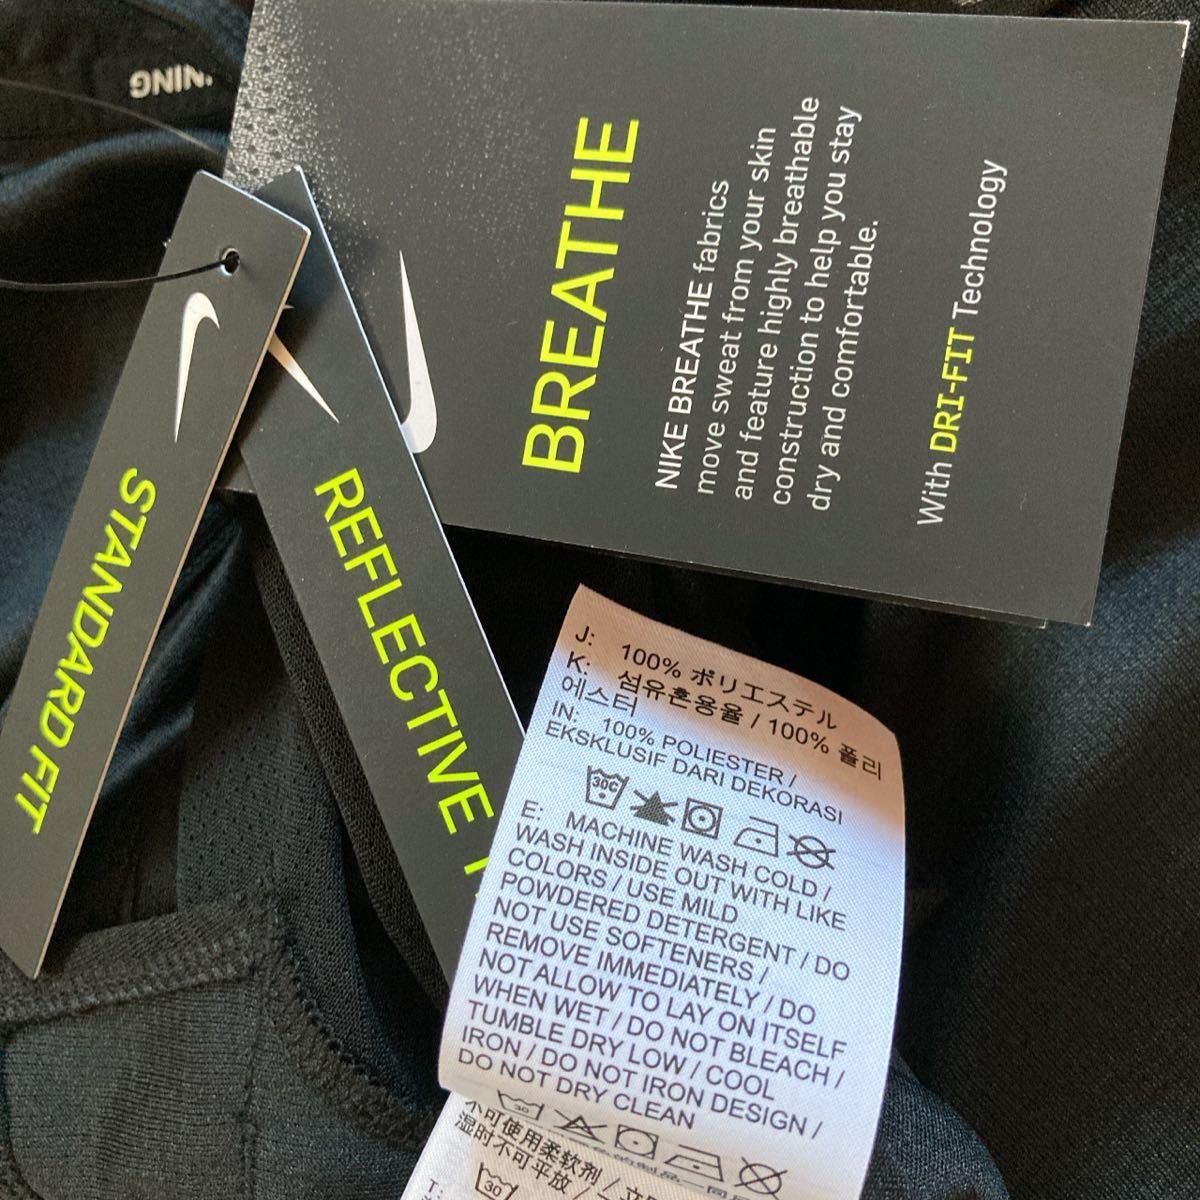 NIKE ランニングタンクトップ メンズM ブラック 新品未使用